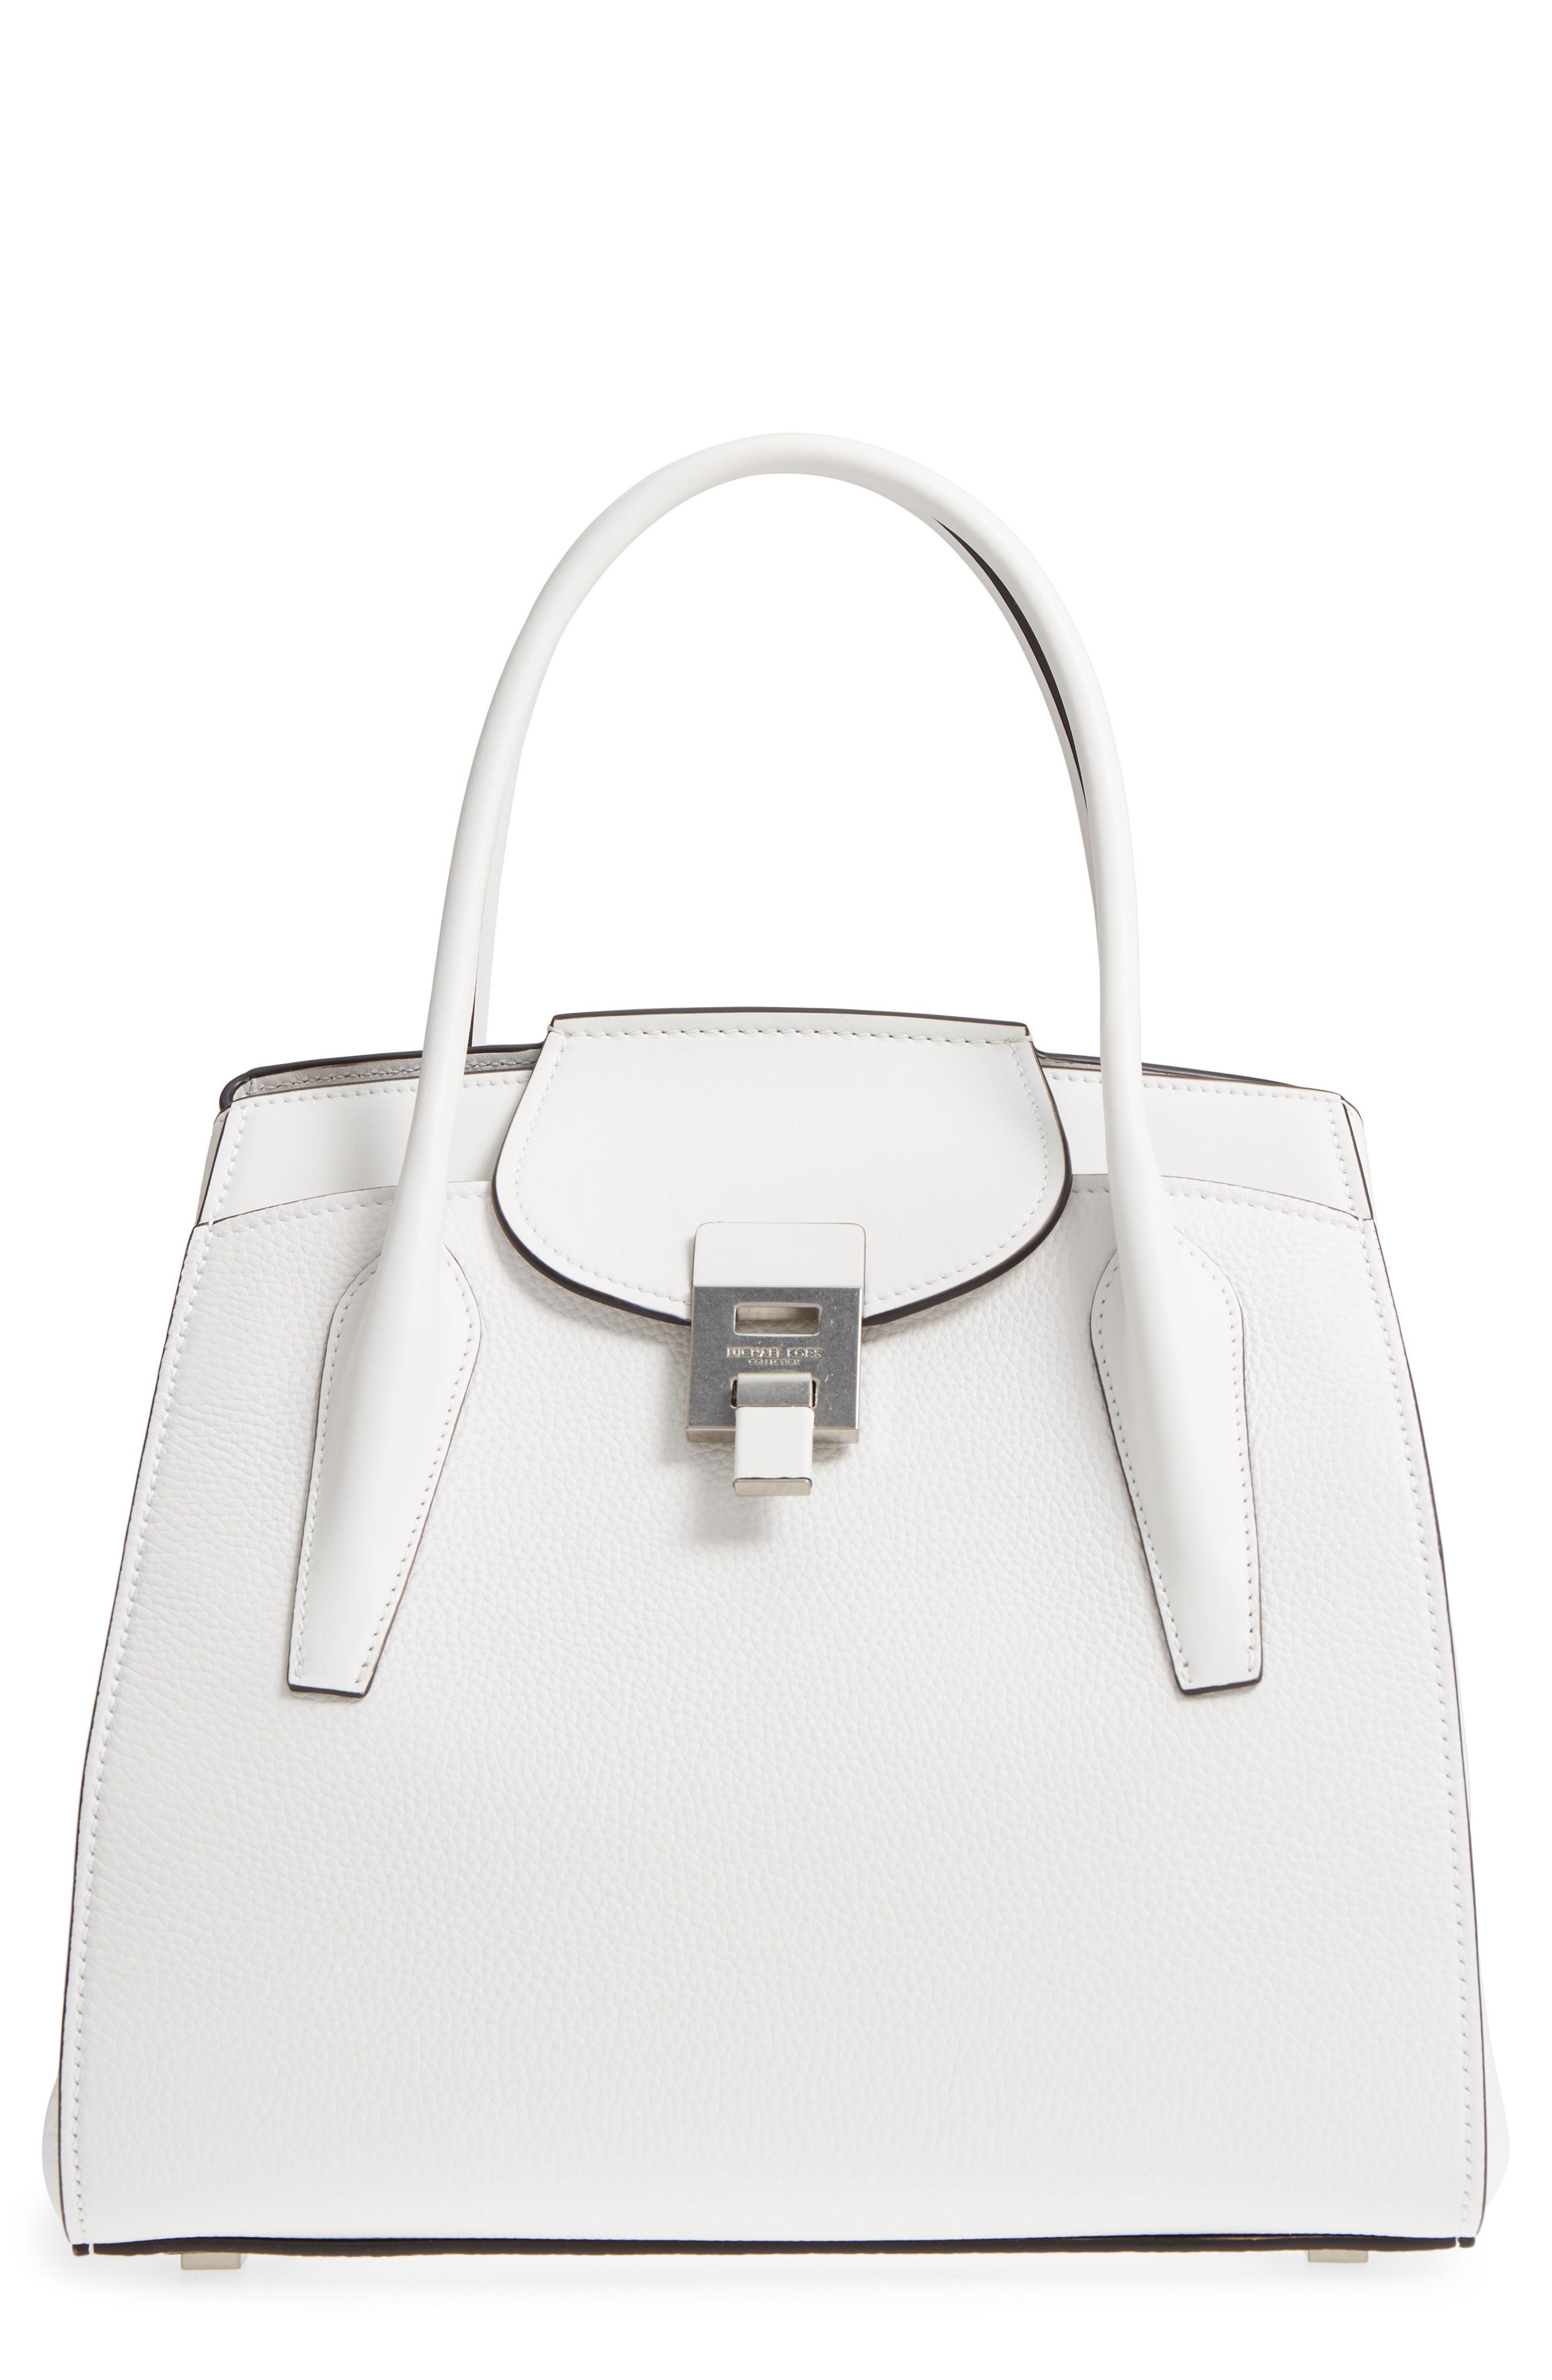 2640x4048 Women's Michael Kors Designer Handbags Amp Wallets Nordstrom